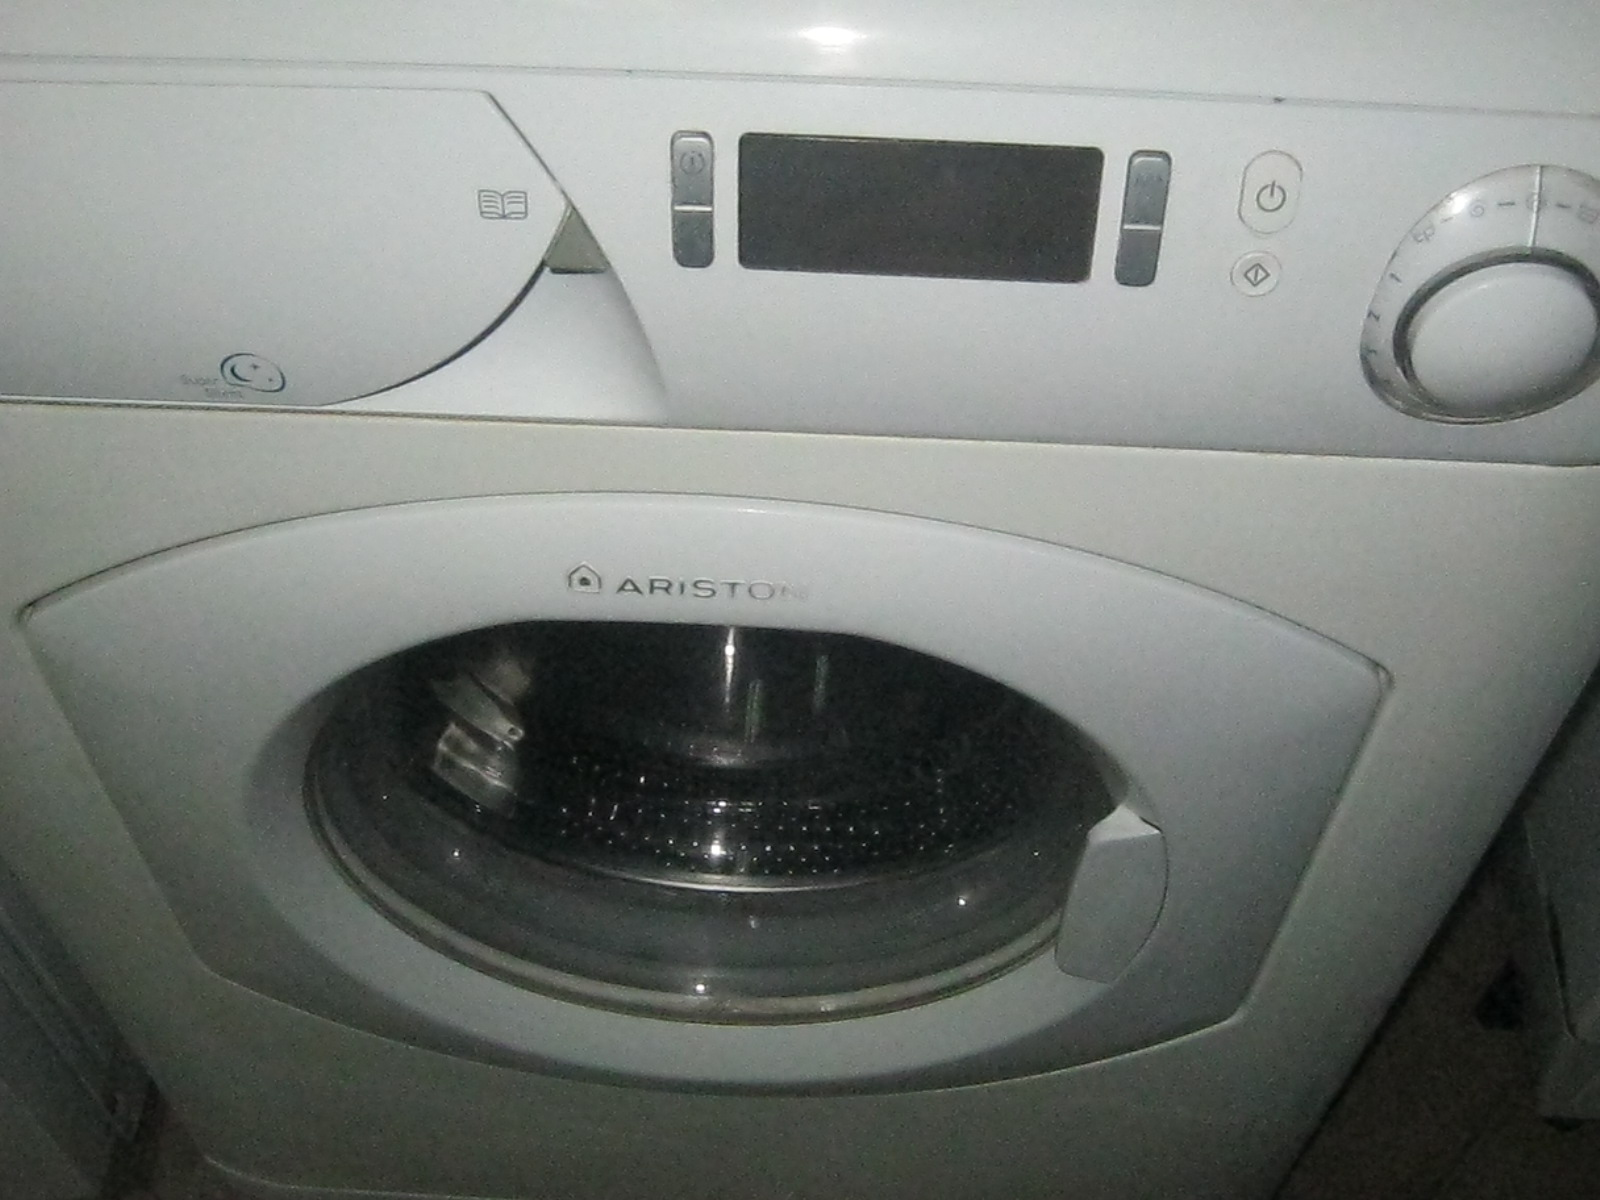 Wspaniały Avsd 107 ariston инструкция VA27